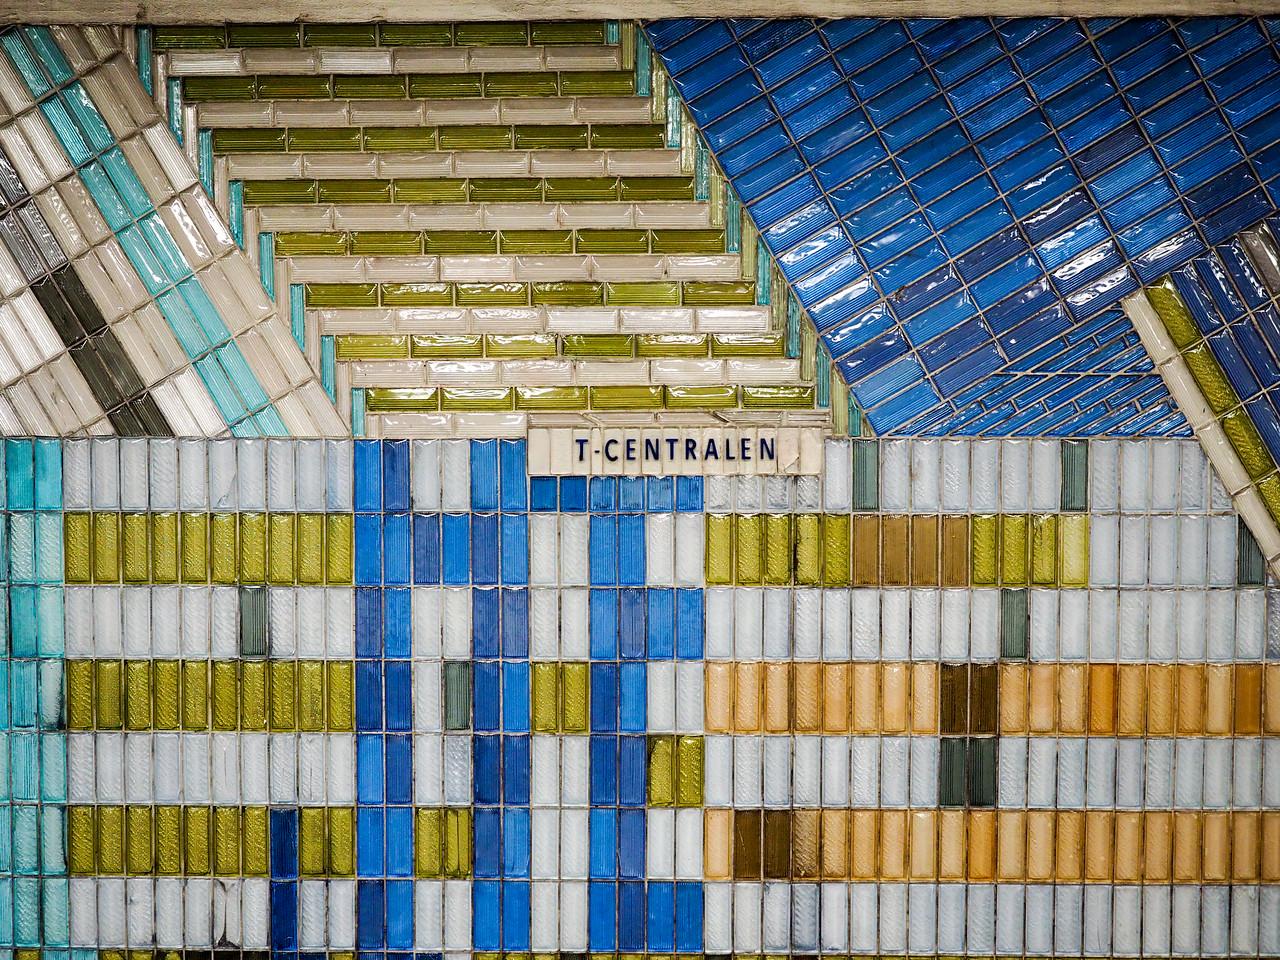 T-centralen metro station in Stockholm